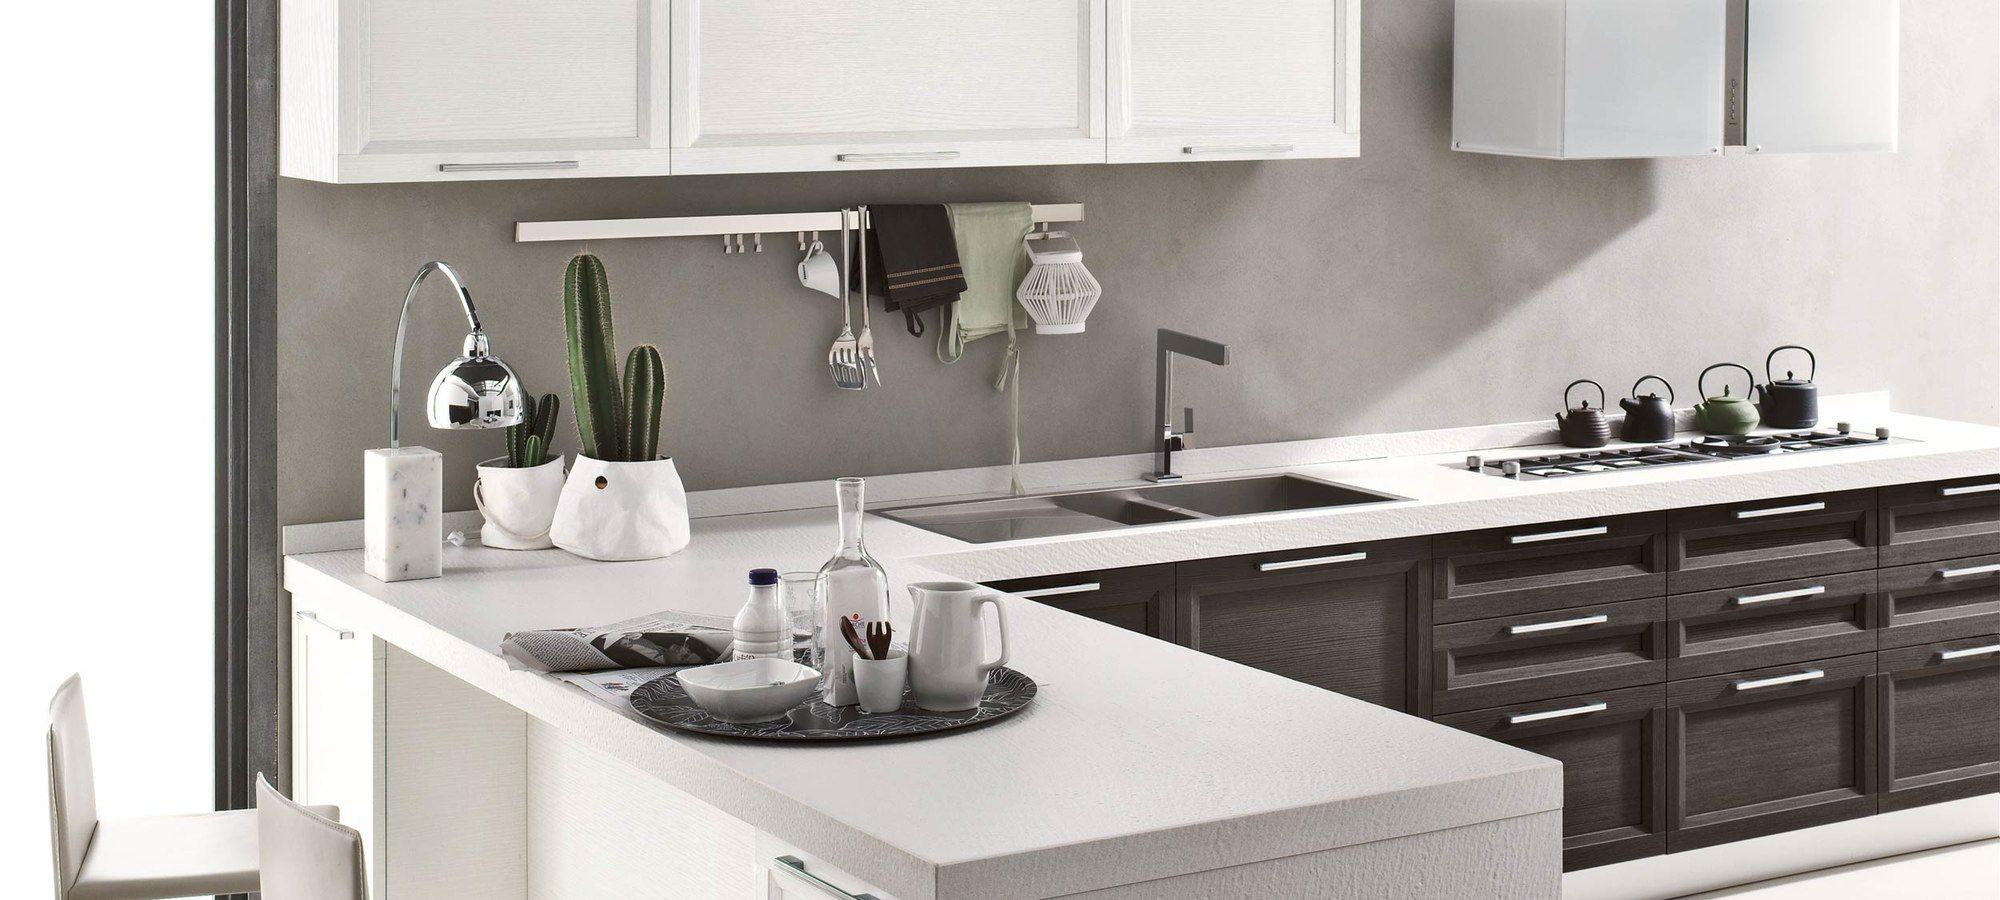 Cucine Moderne Stosa.Cucine Moderne Stosa Modello Cucina Malibu 02 Interior